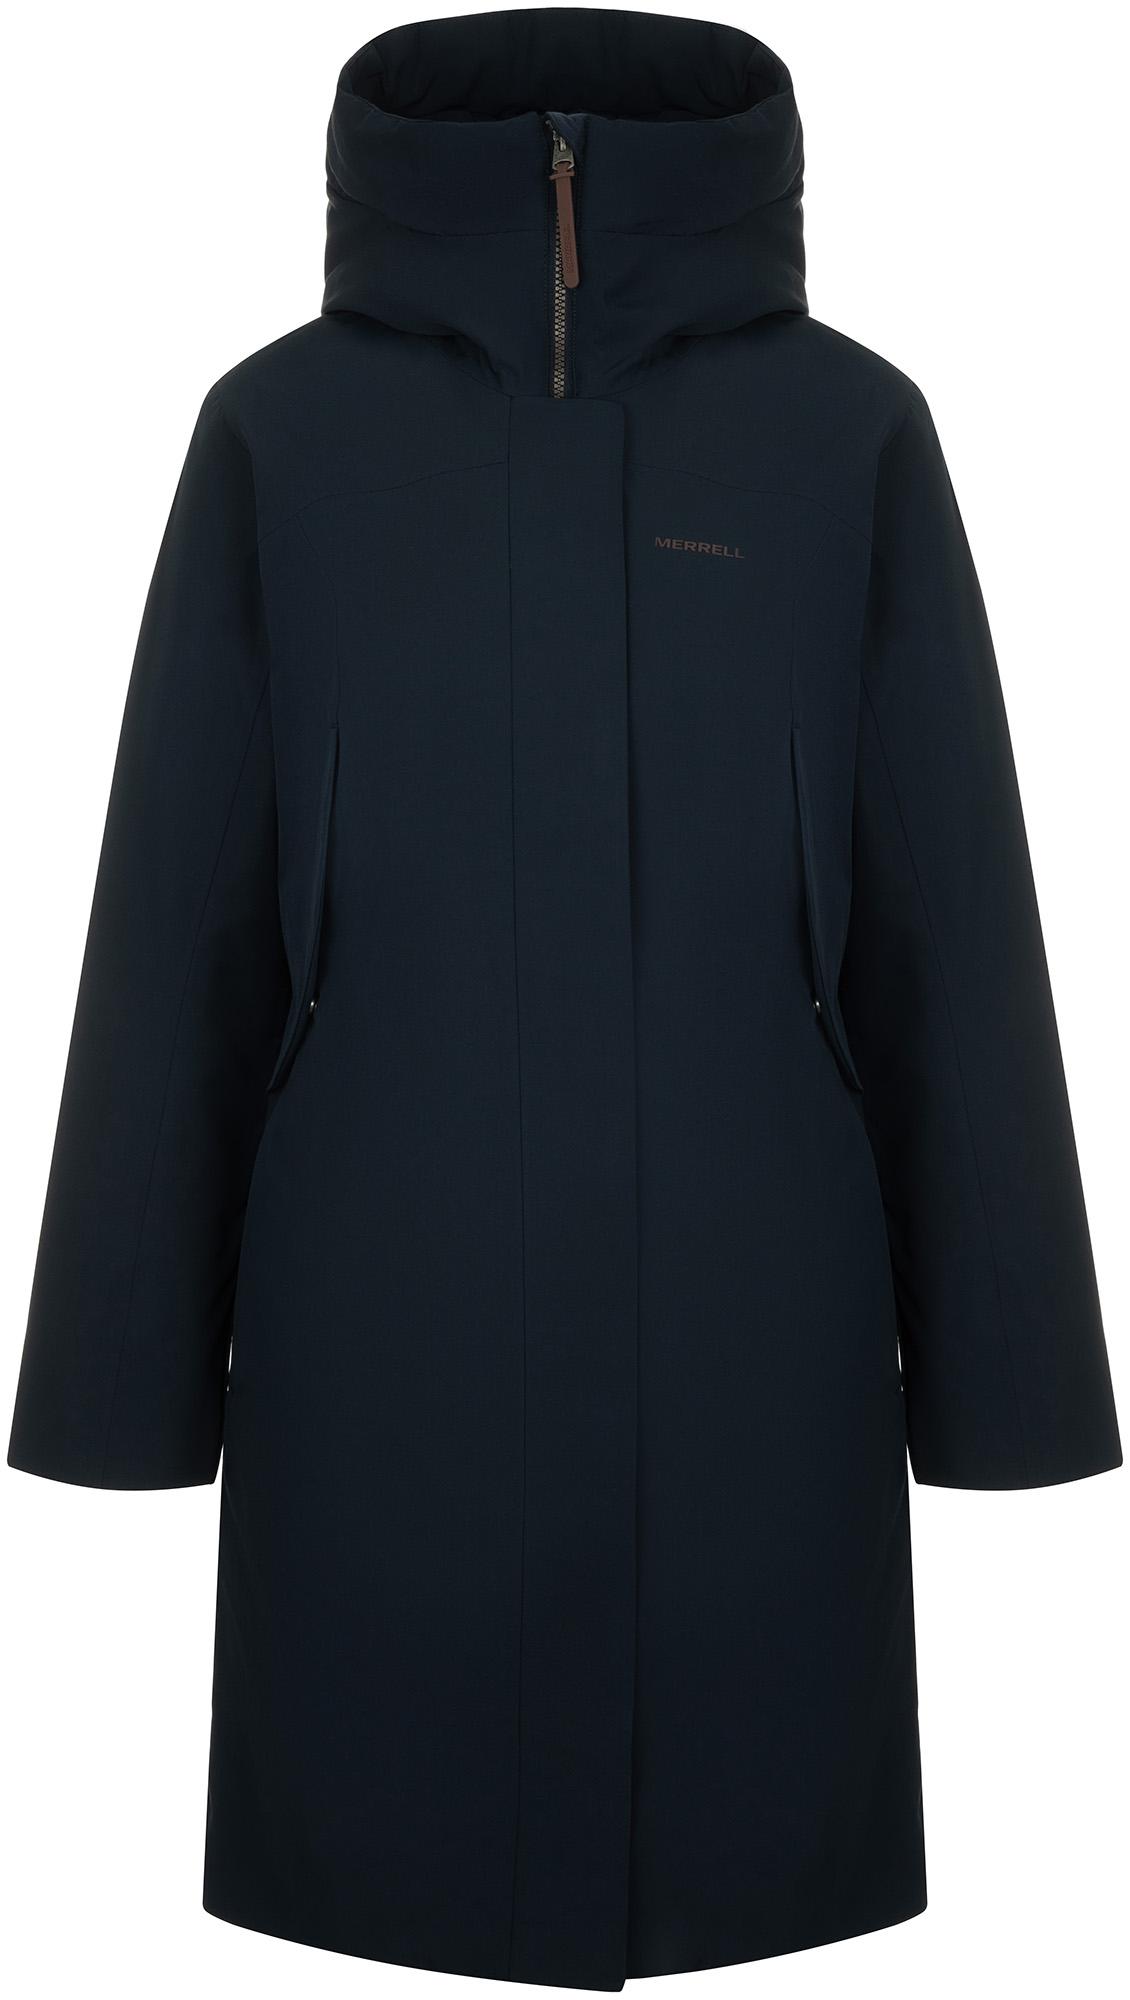 Merrell Куртка утепленная женская Merrell, размер 42 merrell платье женское merrell размер 42